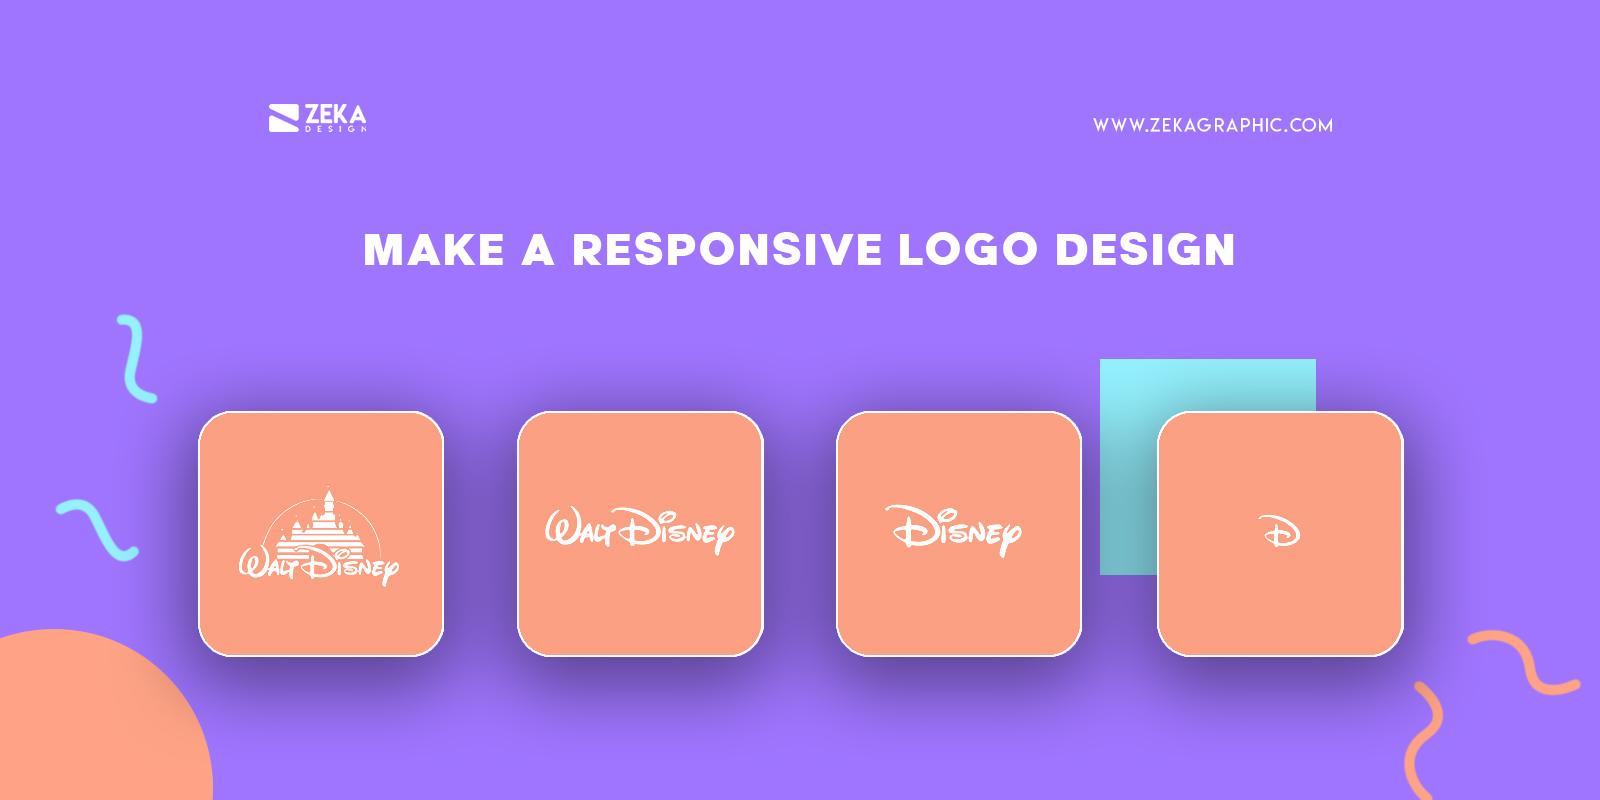 Make a Responsive Logo Design For Timeless brand logo